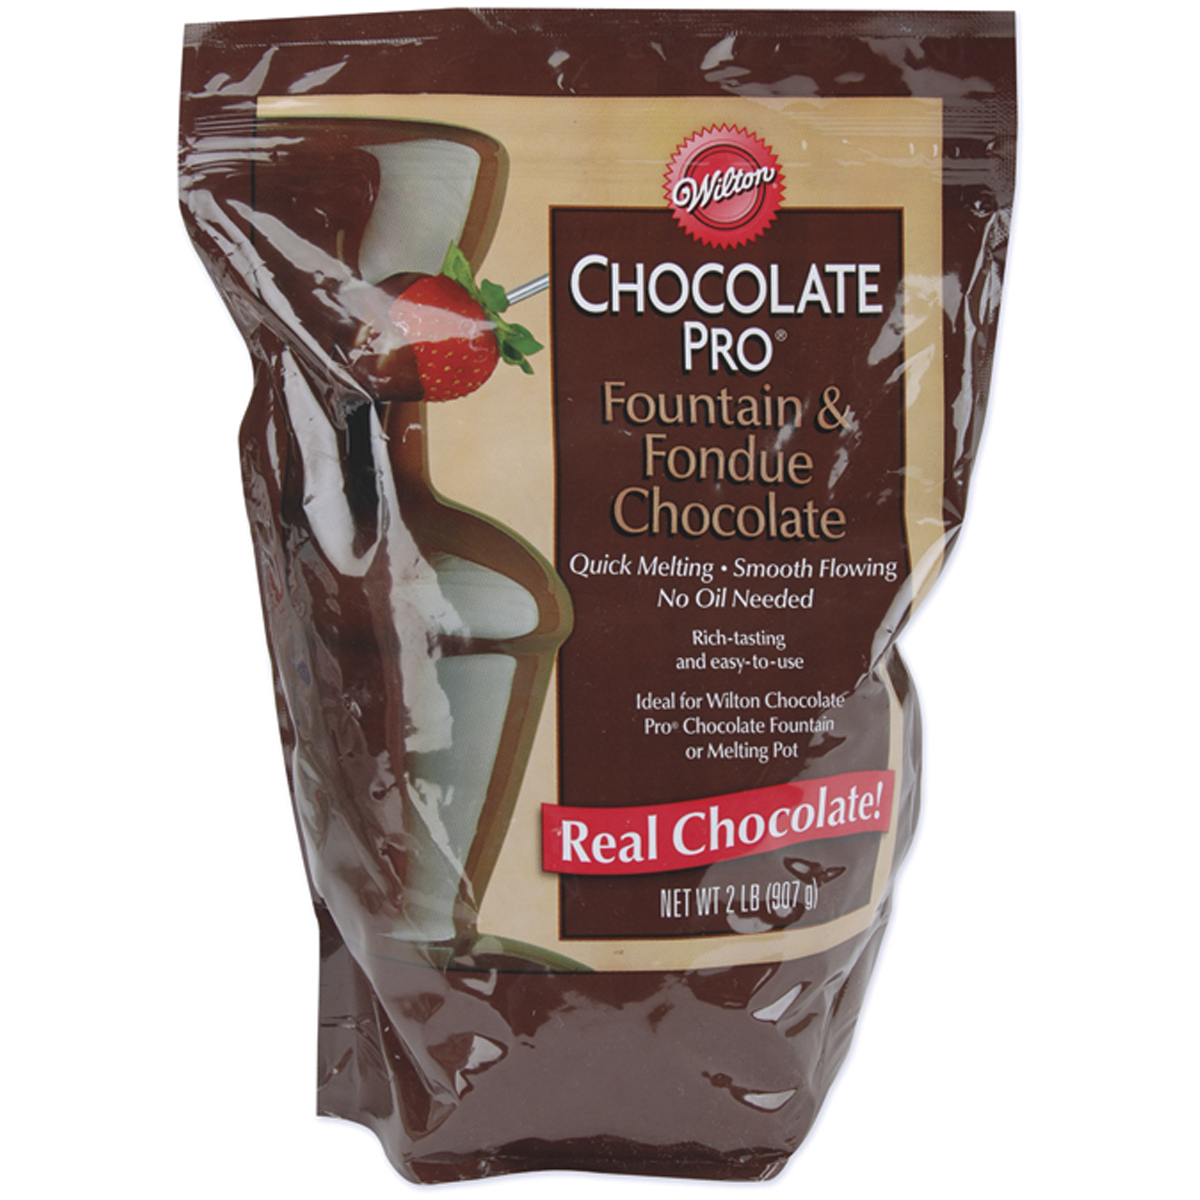 Chocolate Pro Fountain & Fondue Chocolate-Wafers 2 Pounds by